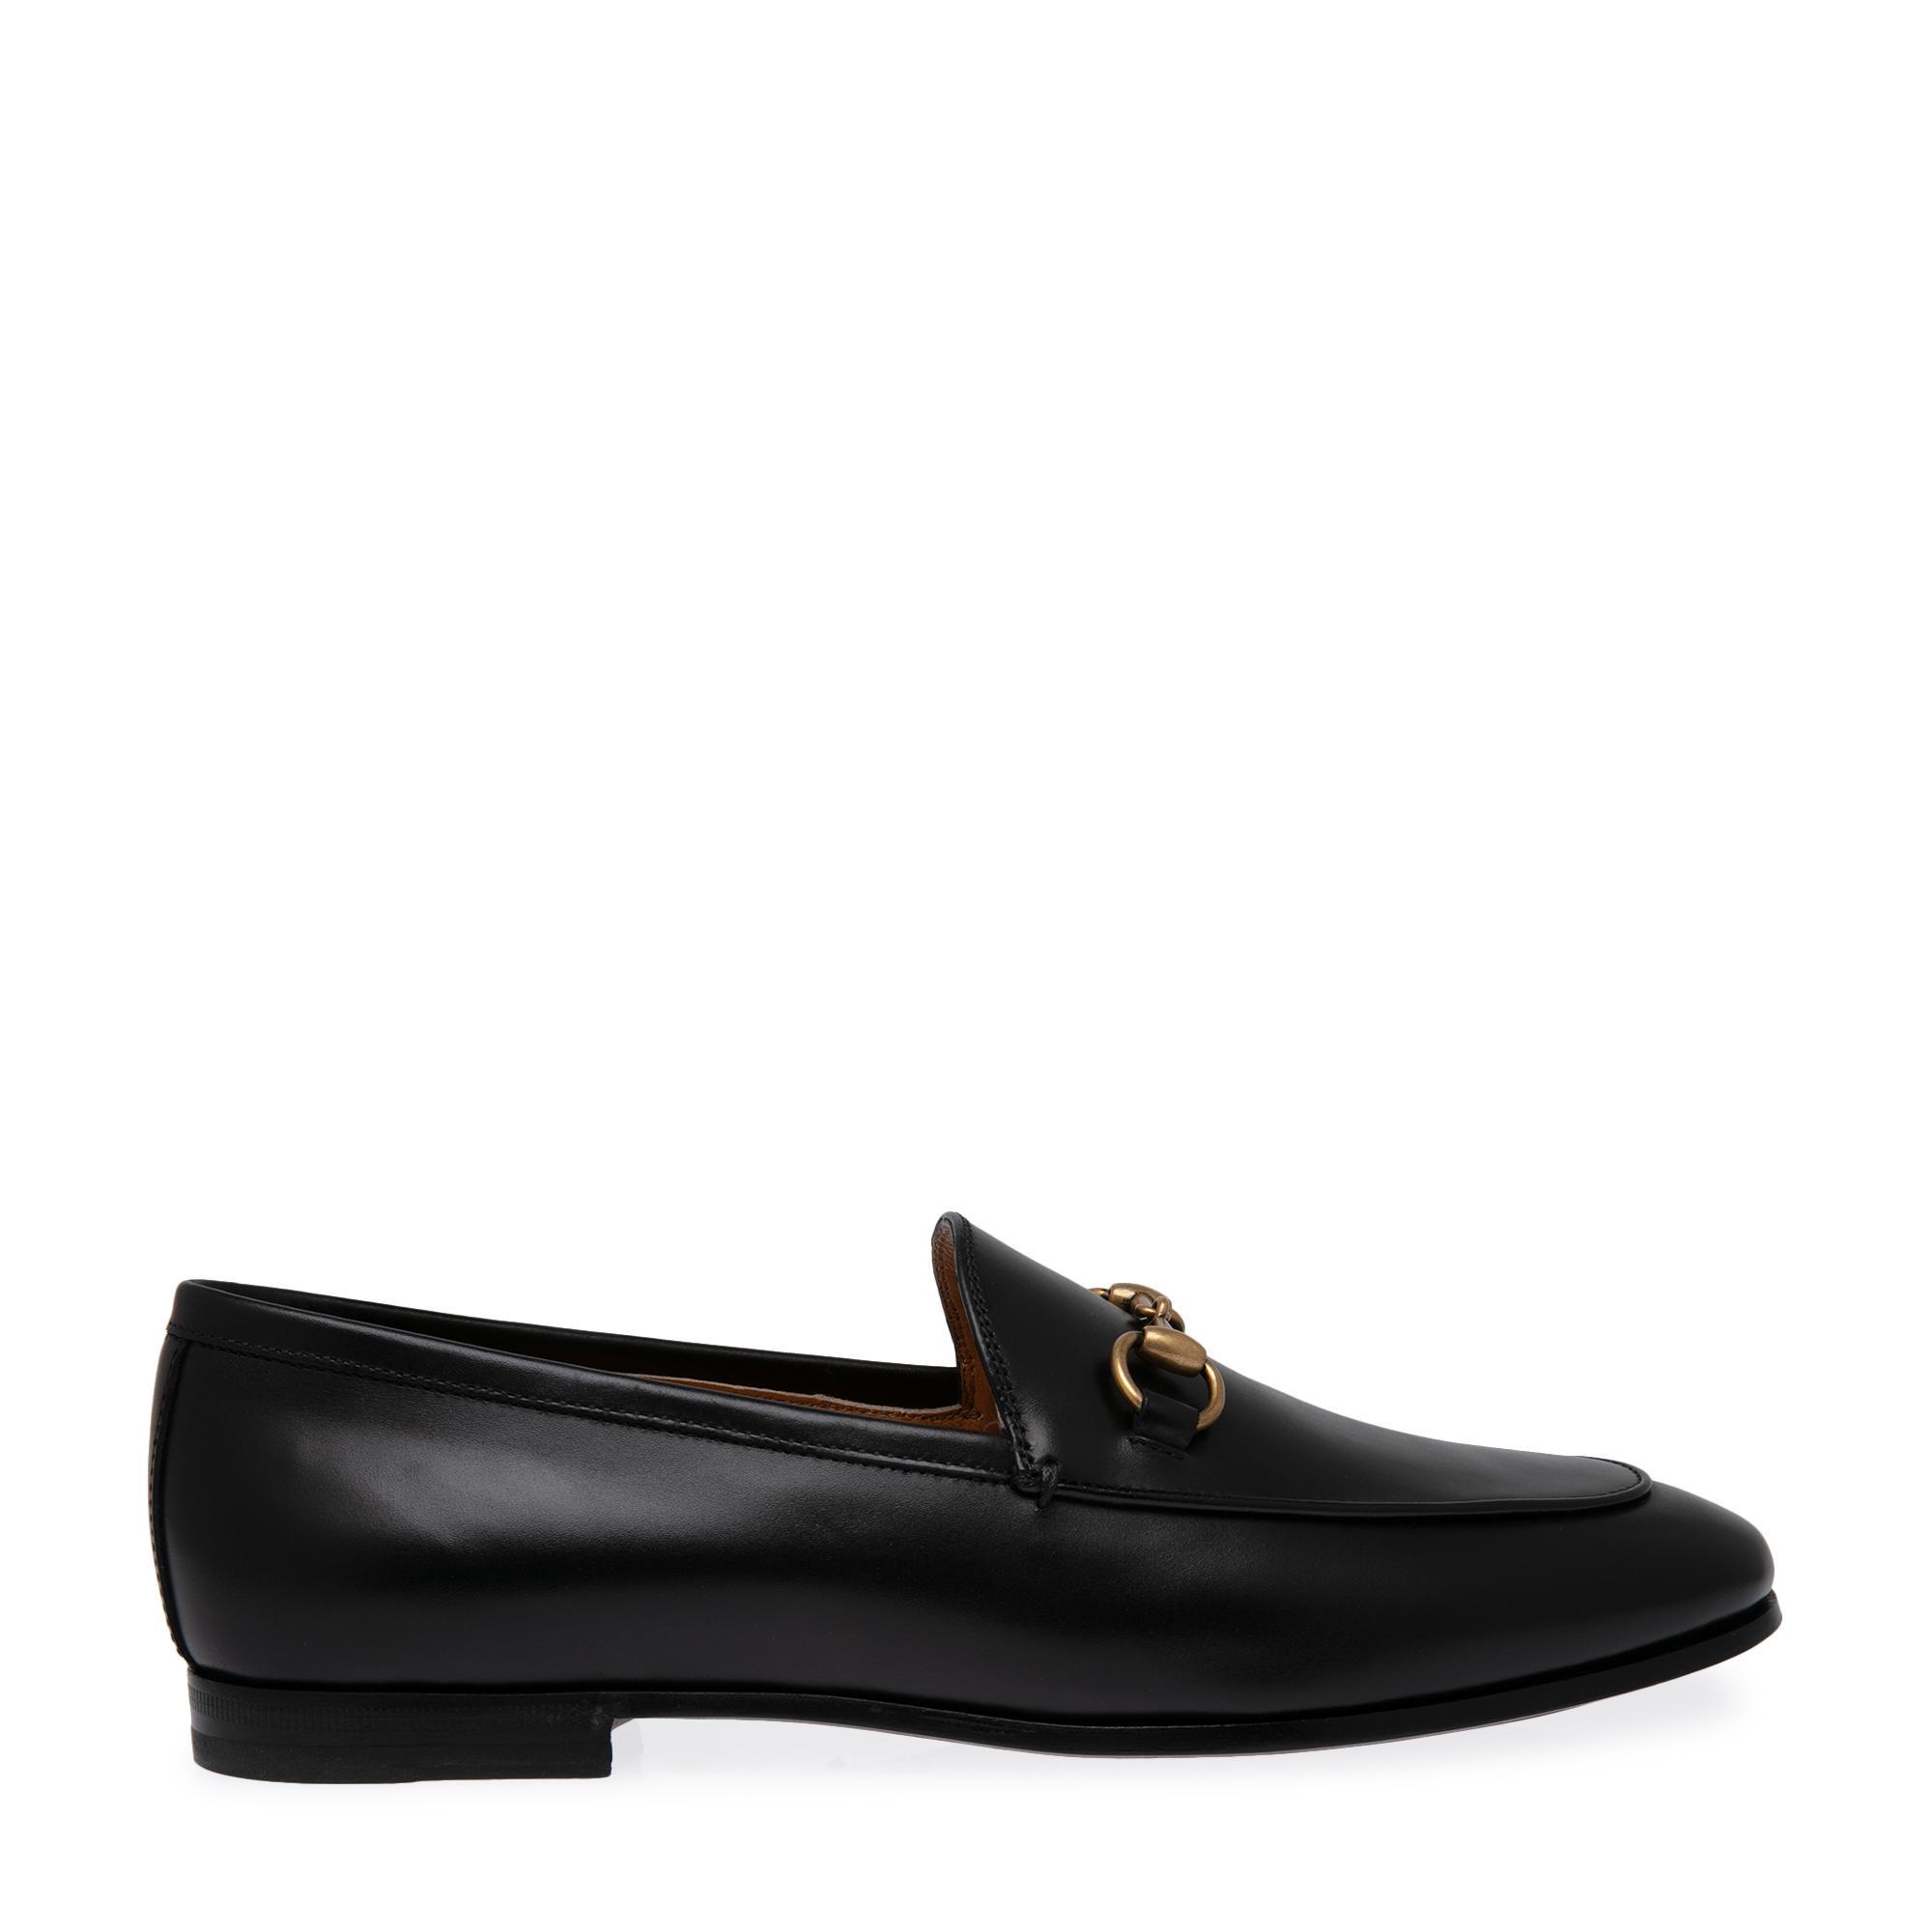 "حذاء الموكاسان ""جوردان"""